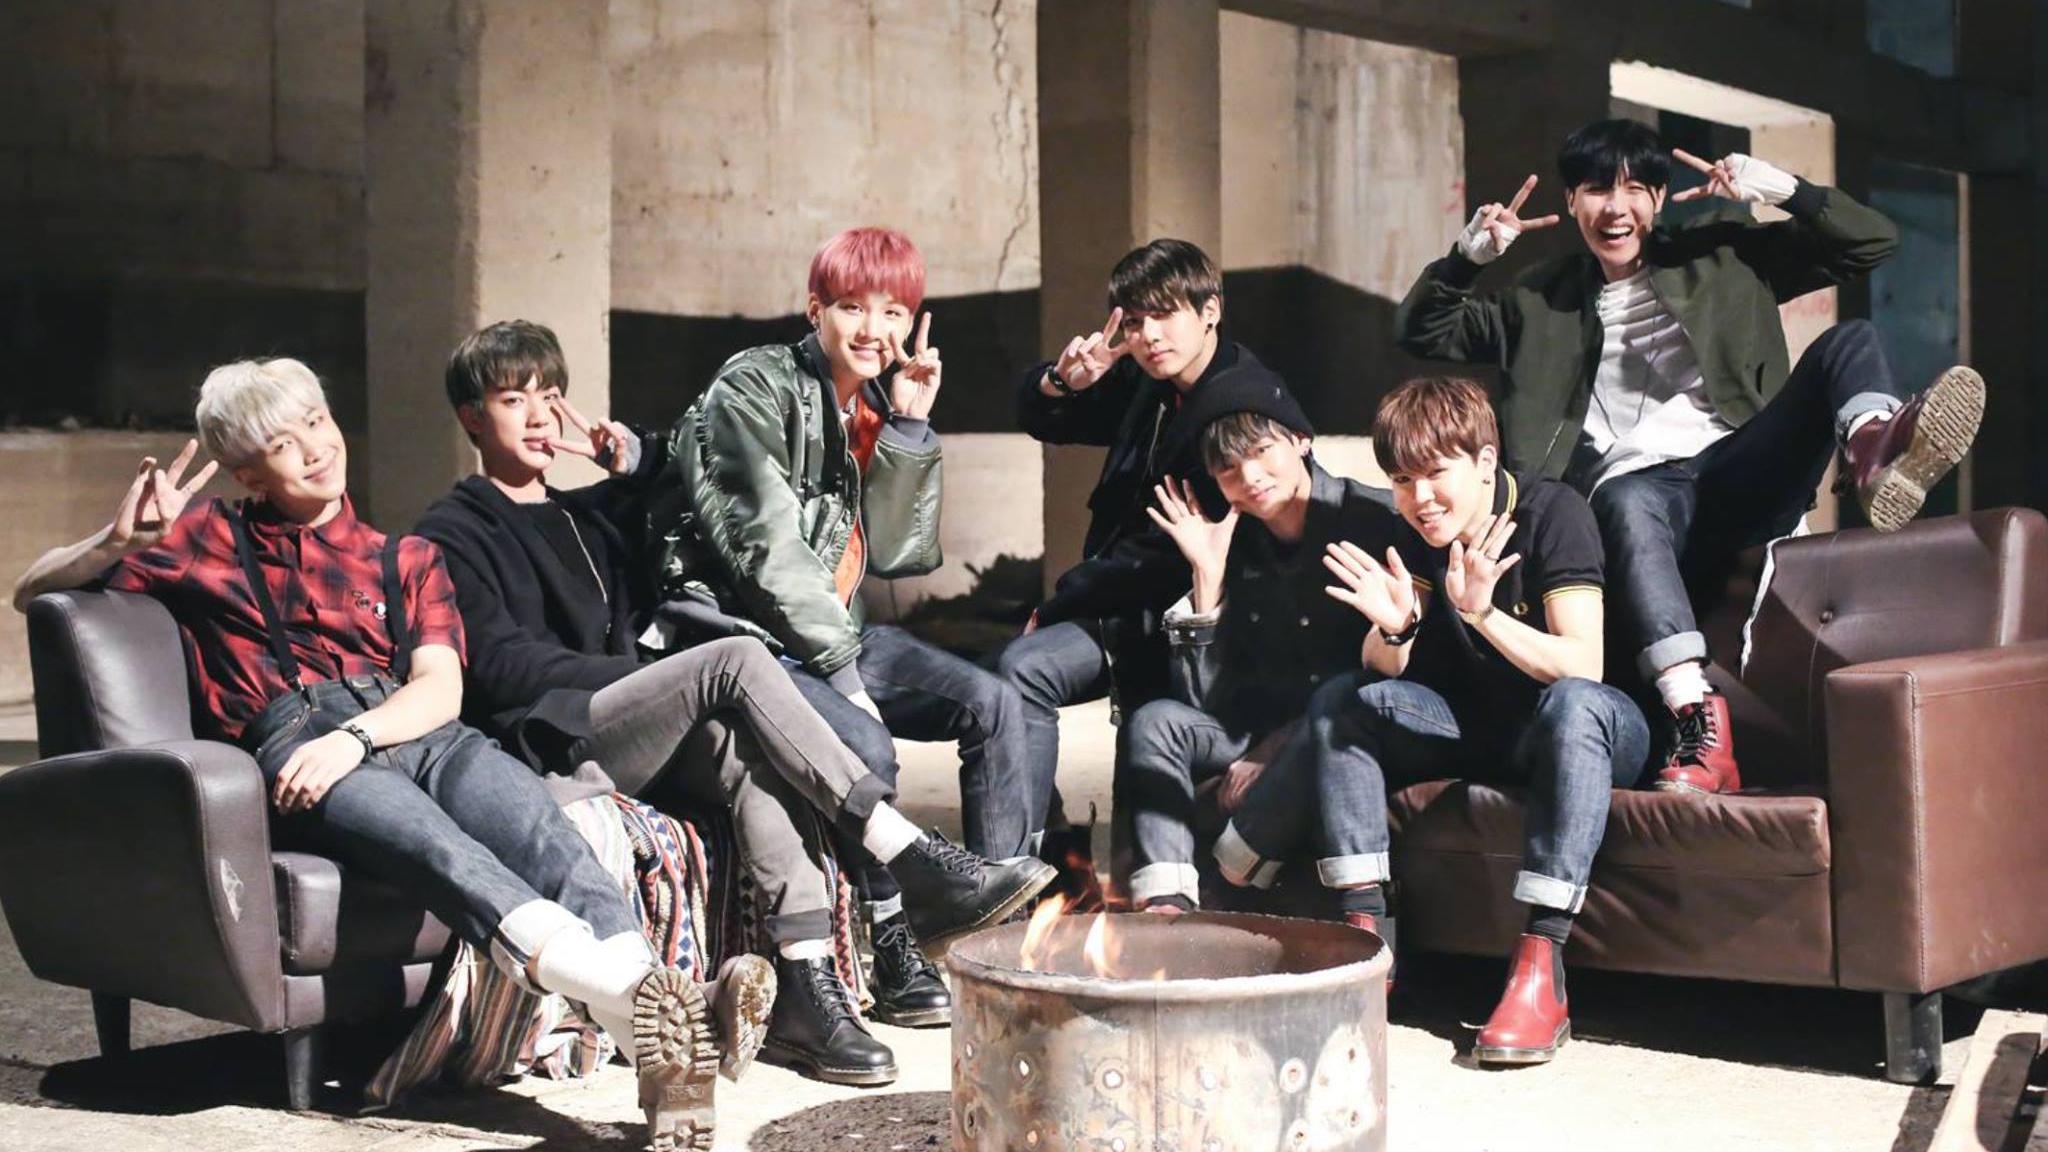 BTS Bangtan Boys Wallpaper Full HD Free Download